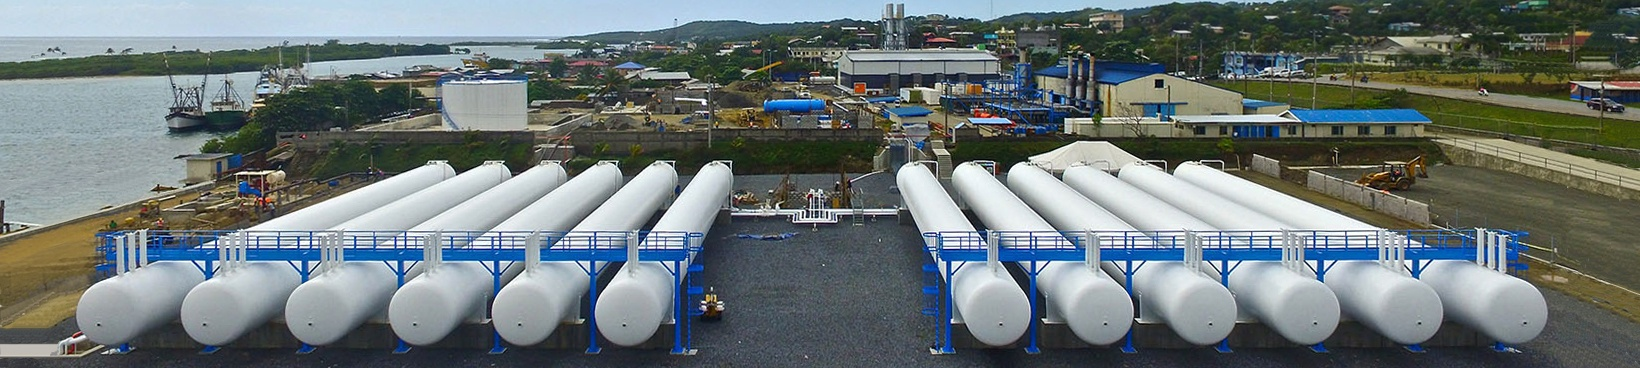 LPG Power Generation - Power, CHP, Base Load - Design Engineering Construction LARGE.jpg